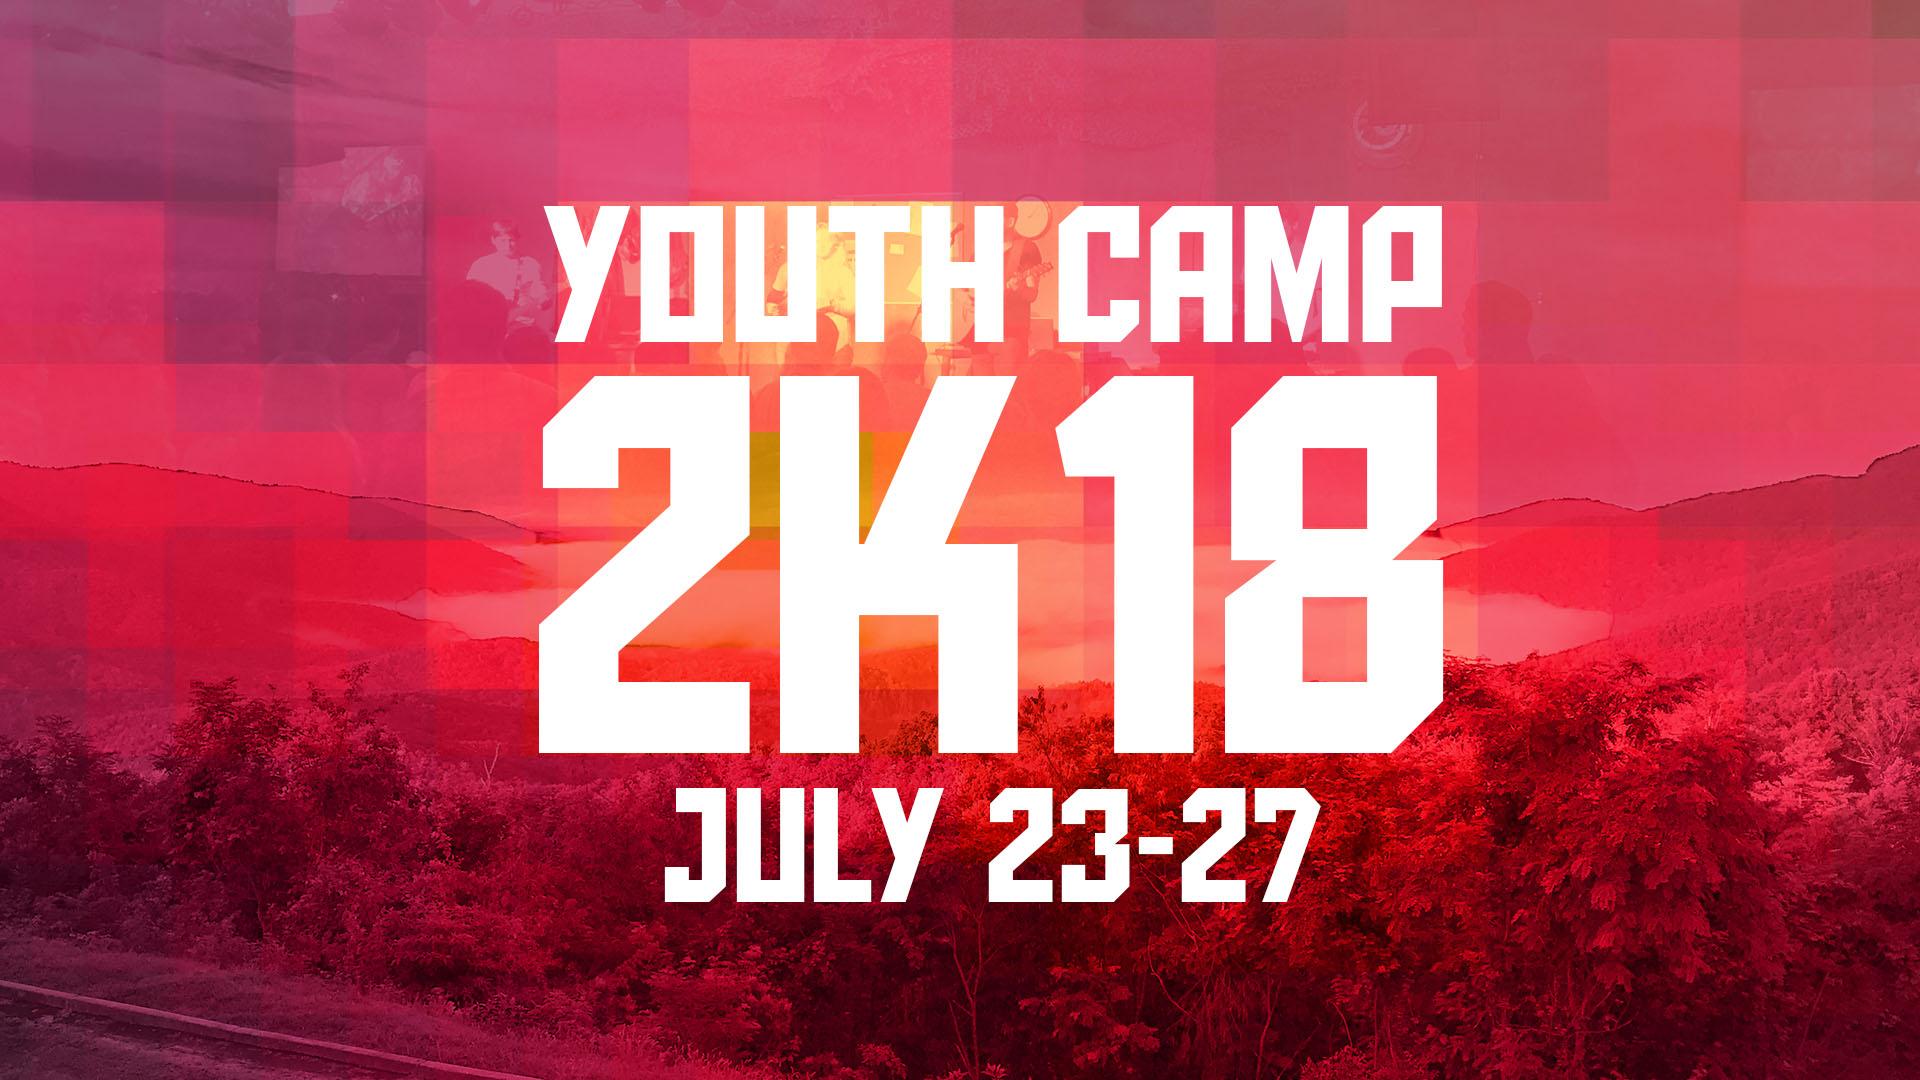 camp-2018-generic-title.jpg